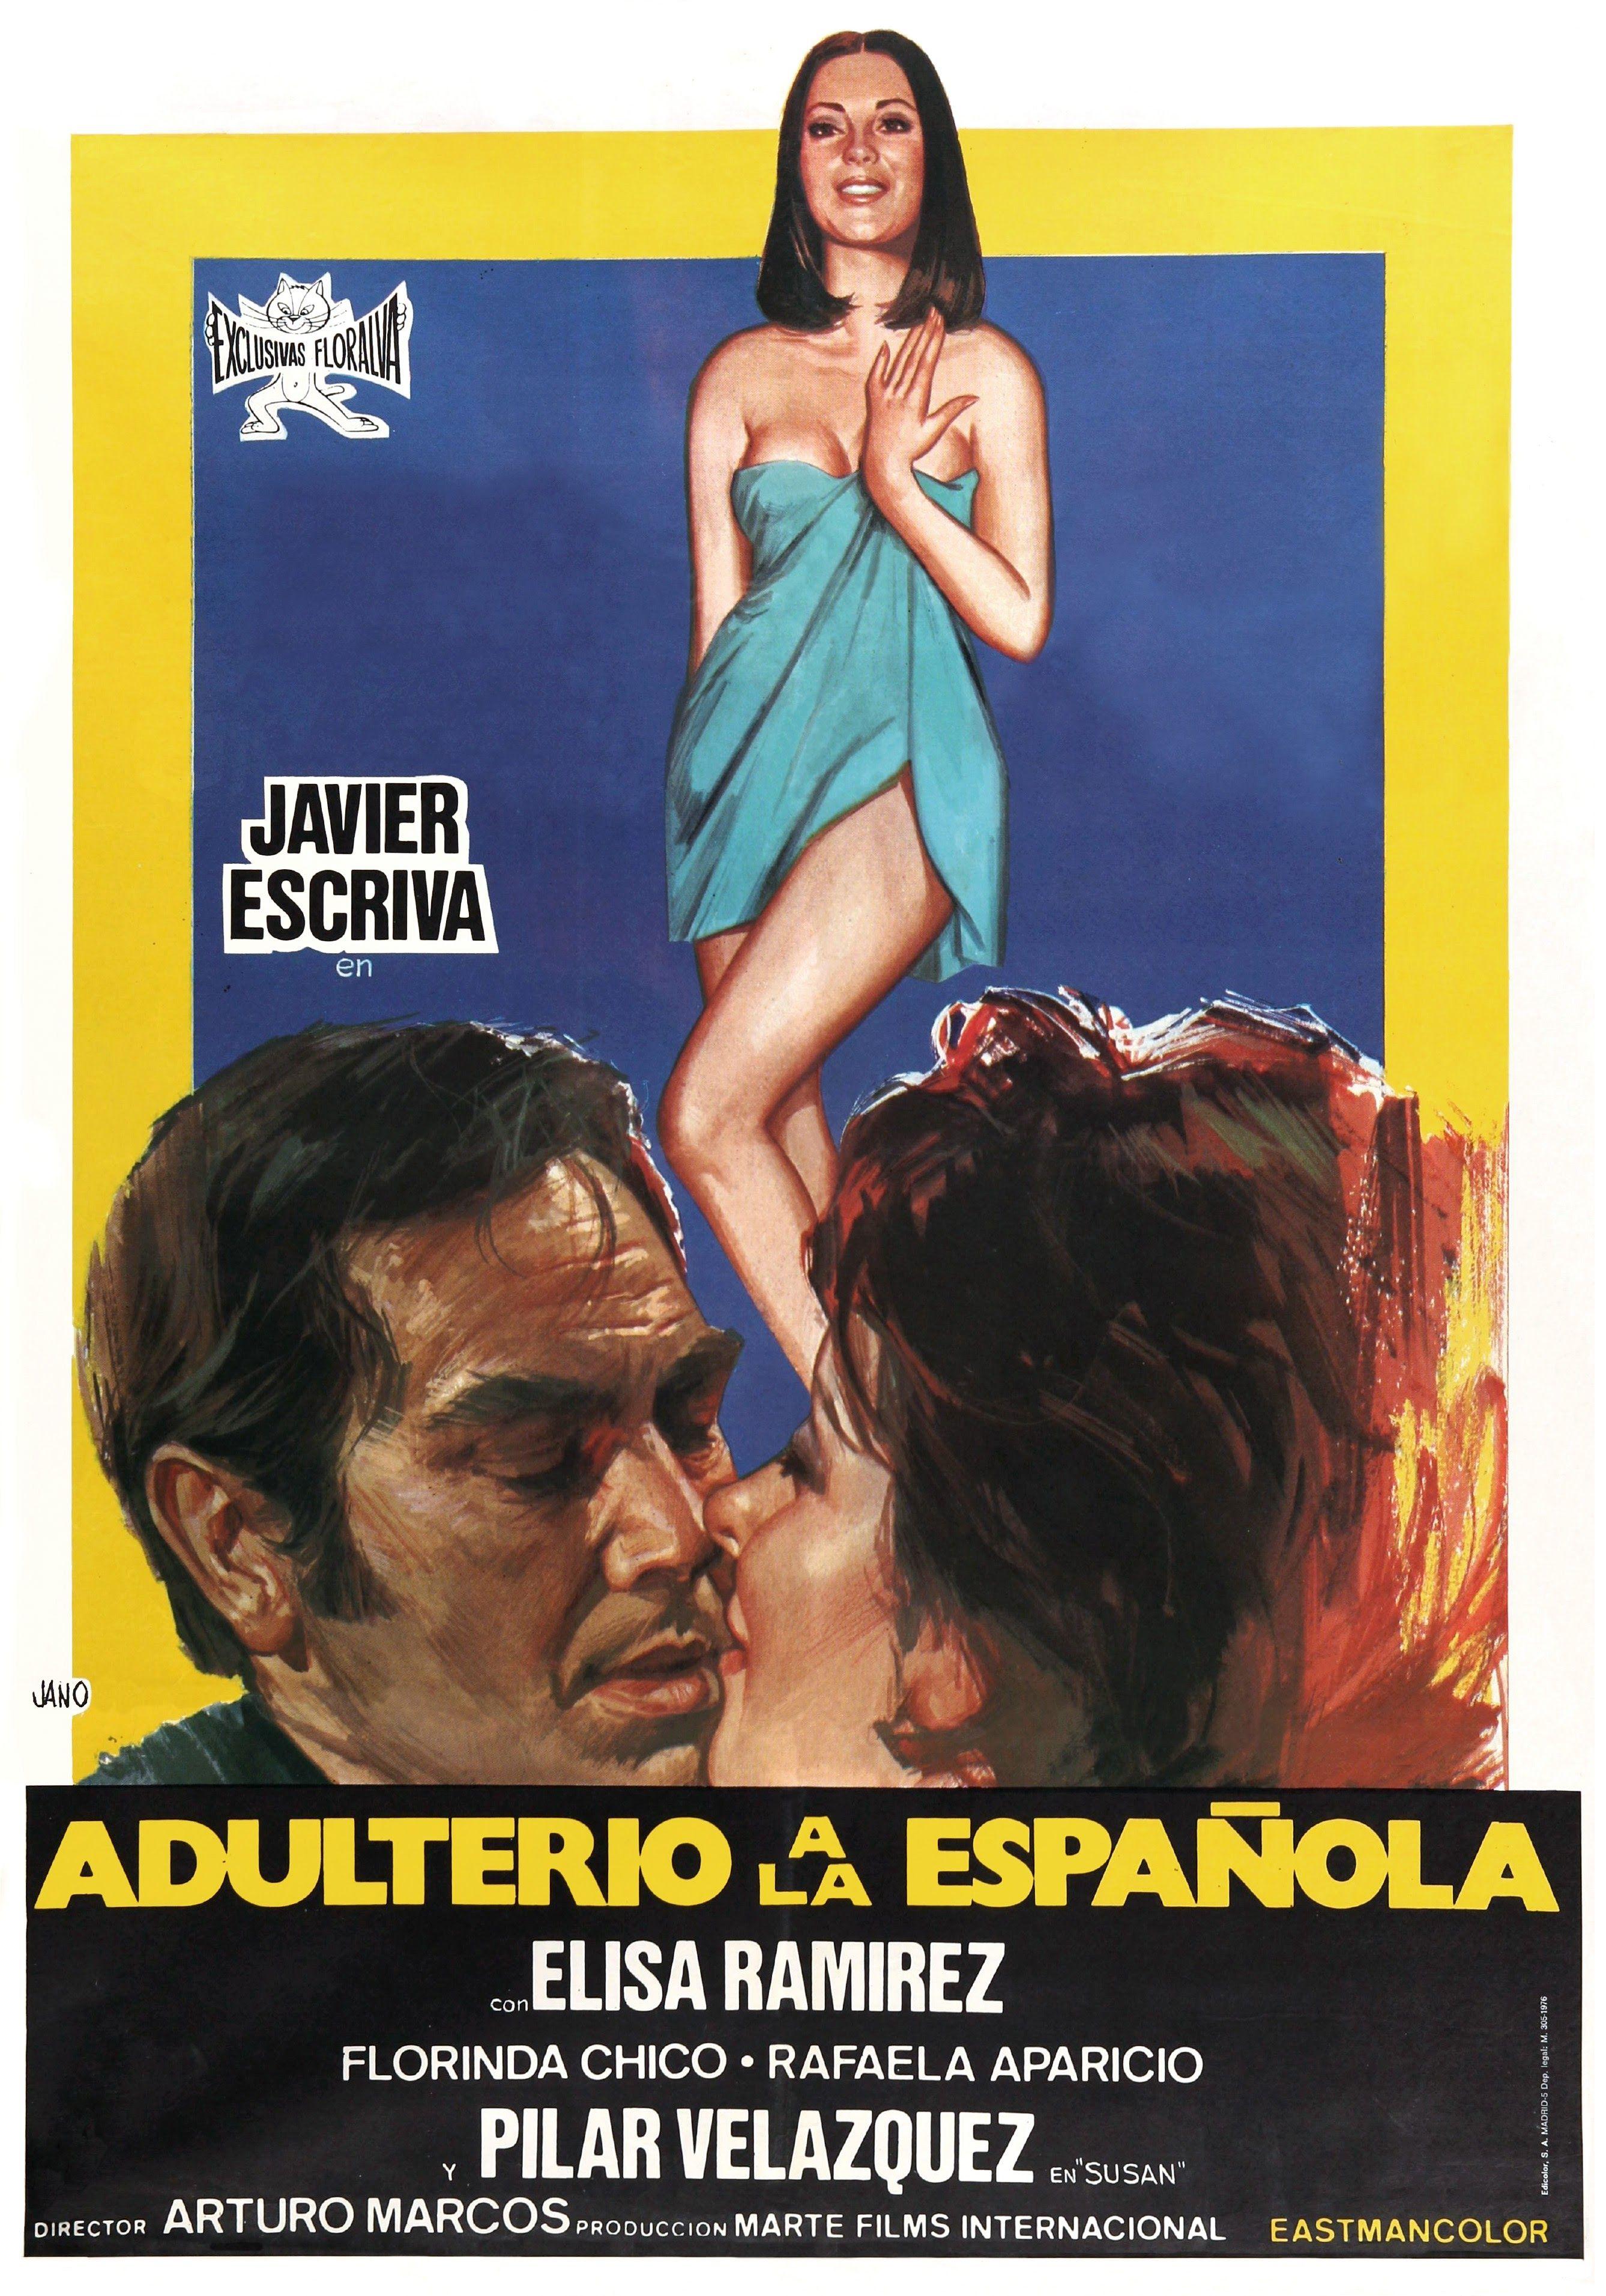 Adulterio Novela Videos Porno adulterio a la española | carteles de cine, español, clasico